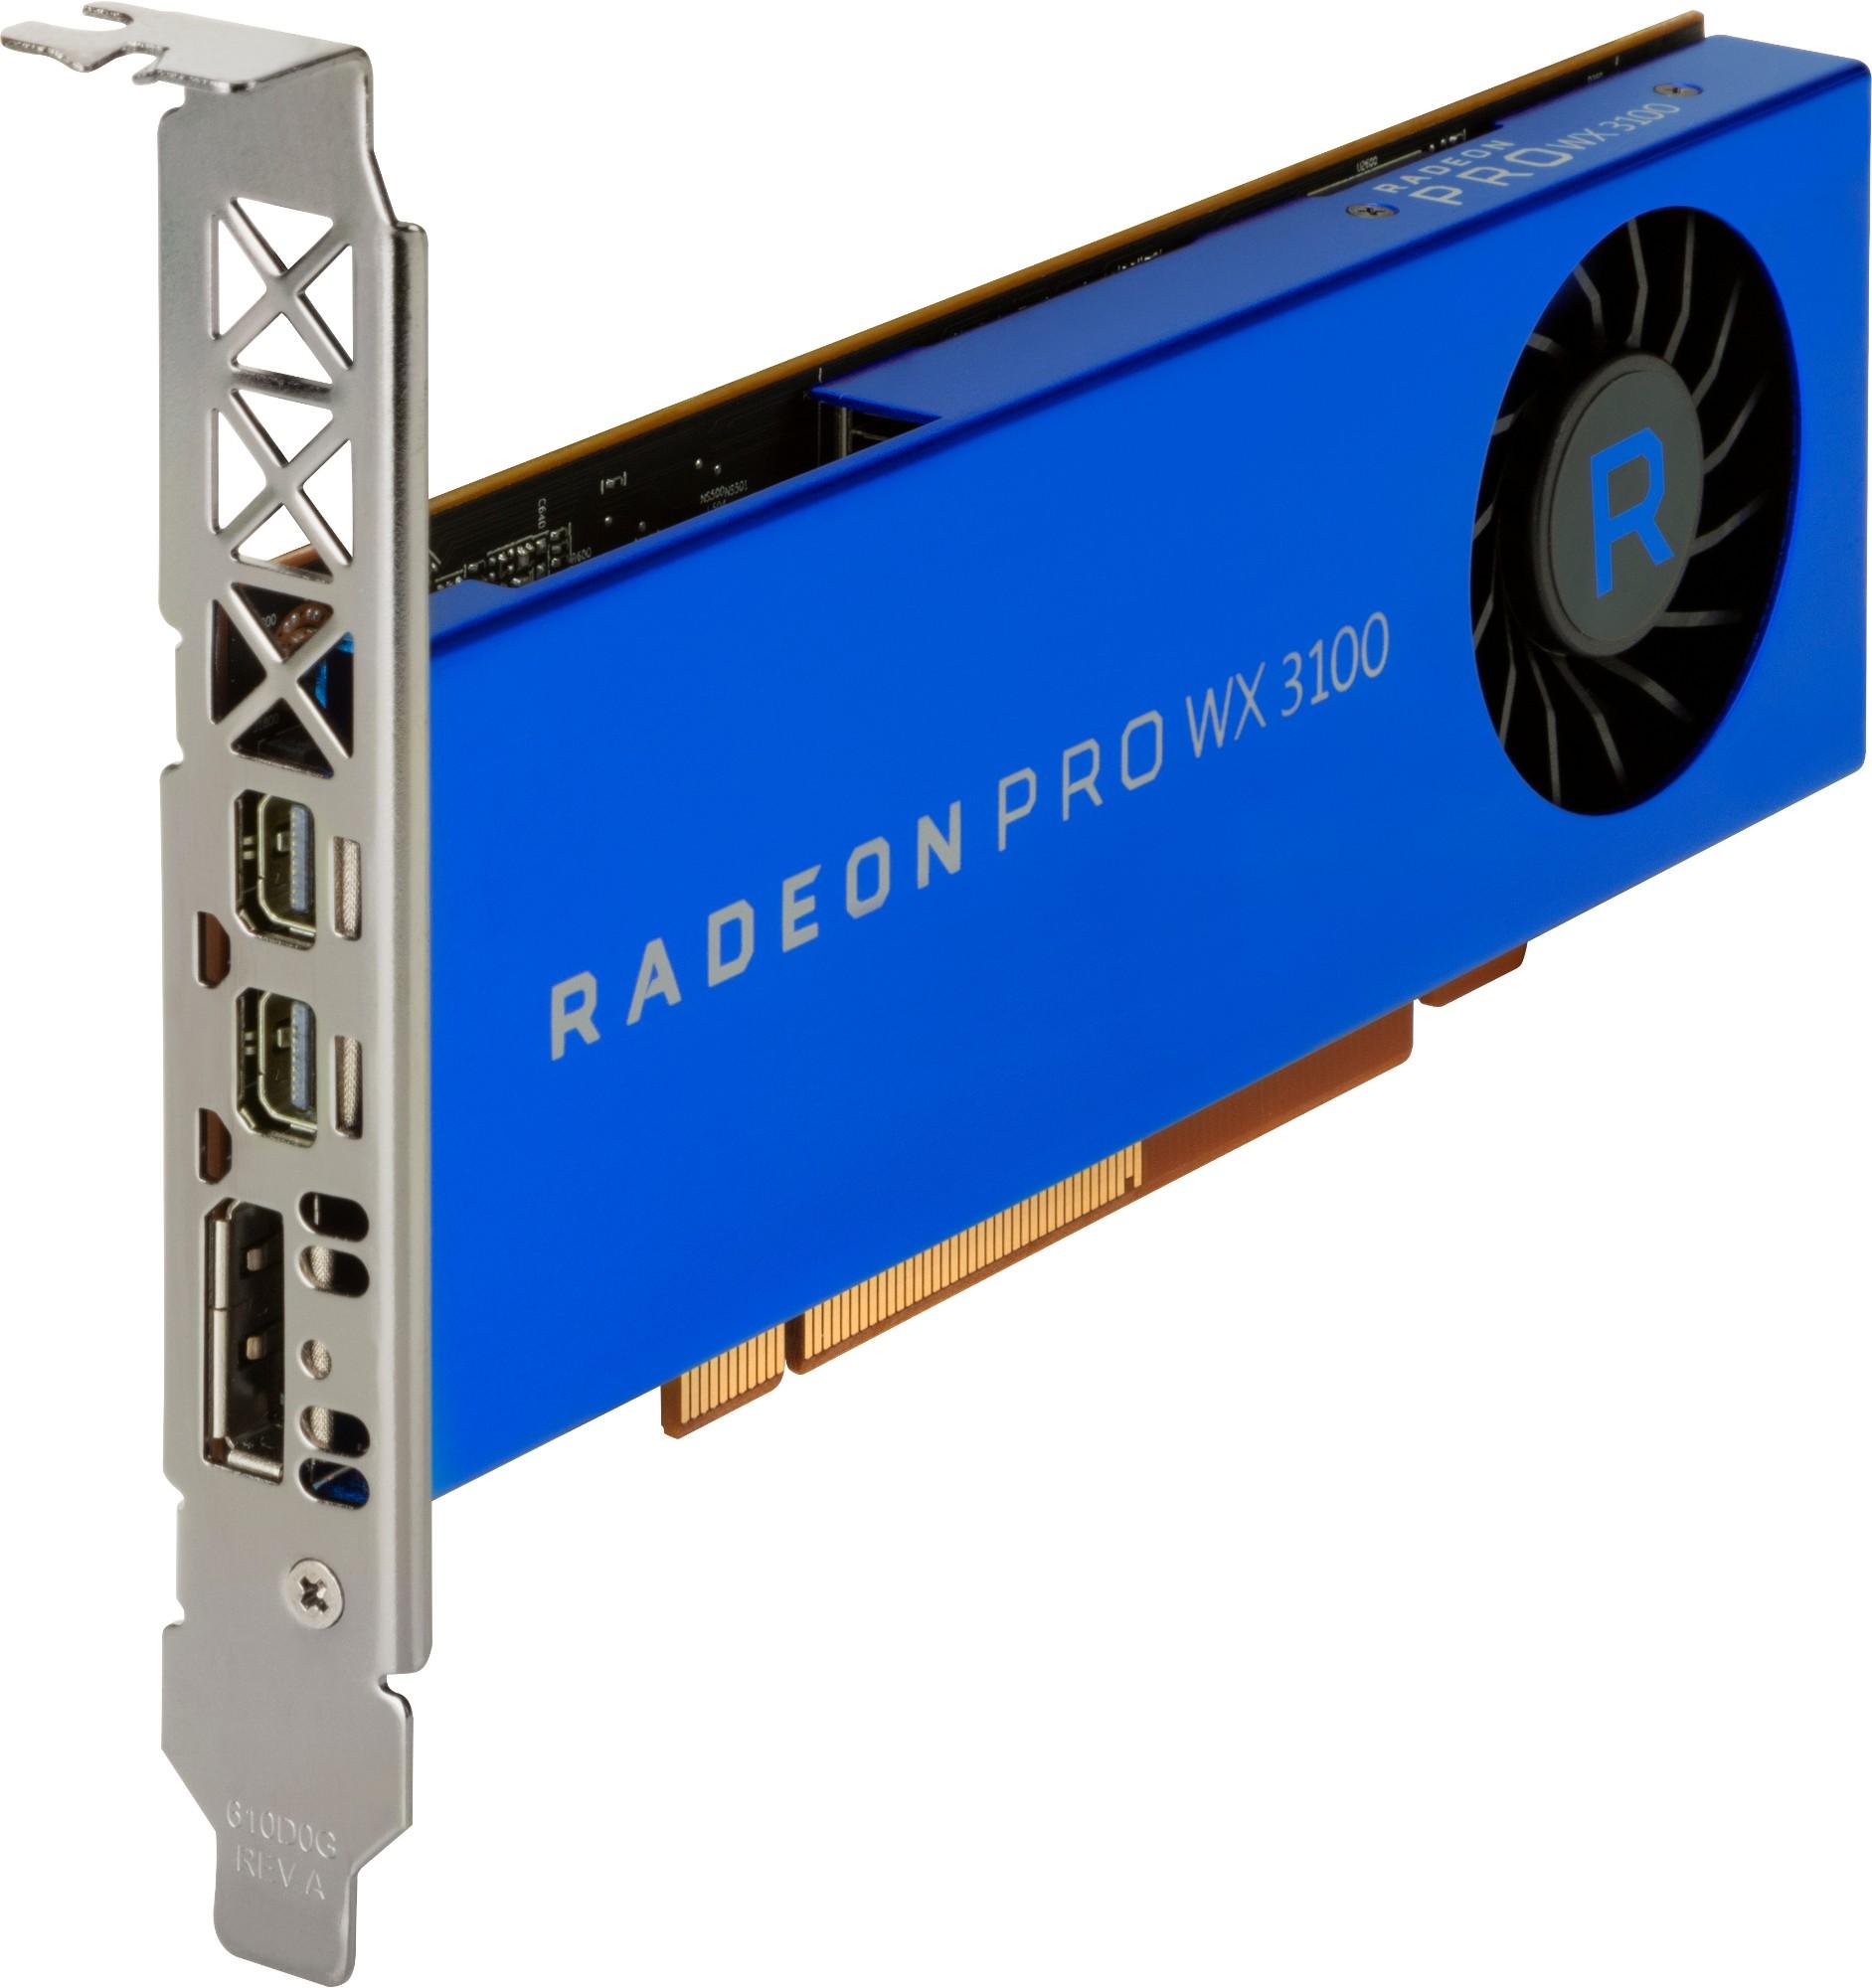 HP 2TF08AA graphics card AMD Radeon Pro WX 3100 4 GB GDDR5